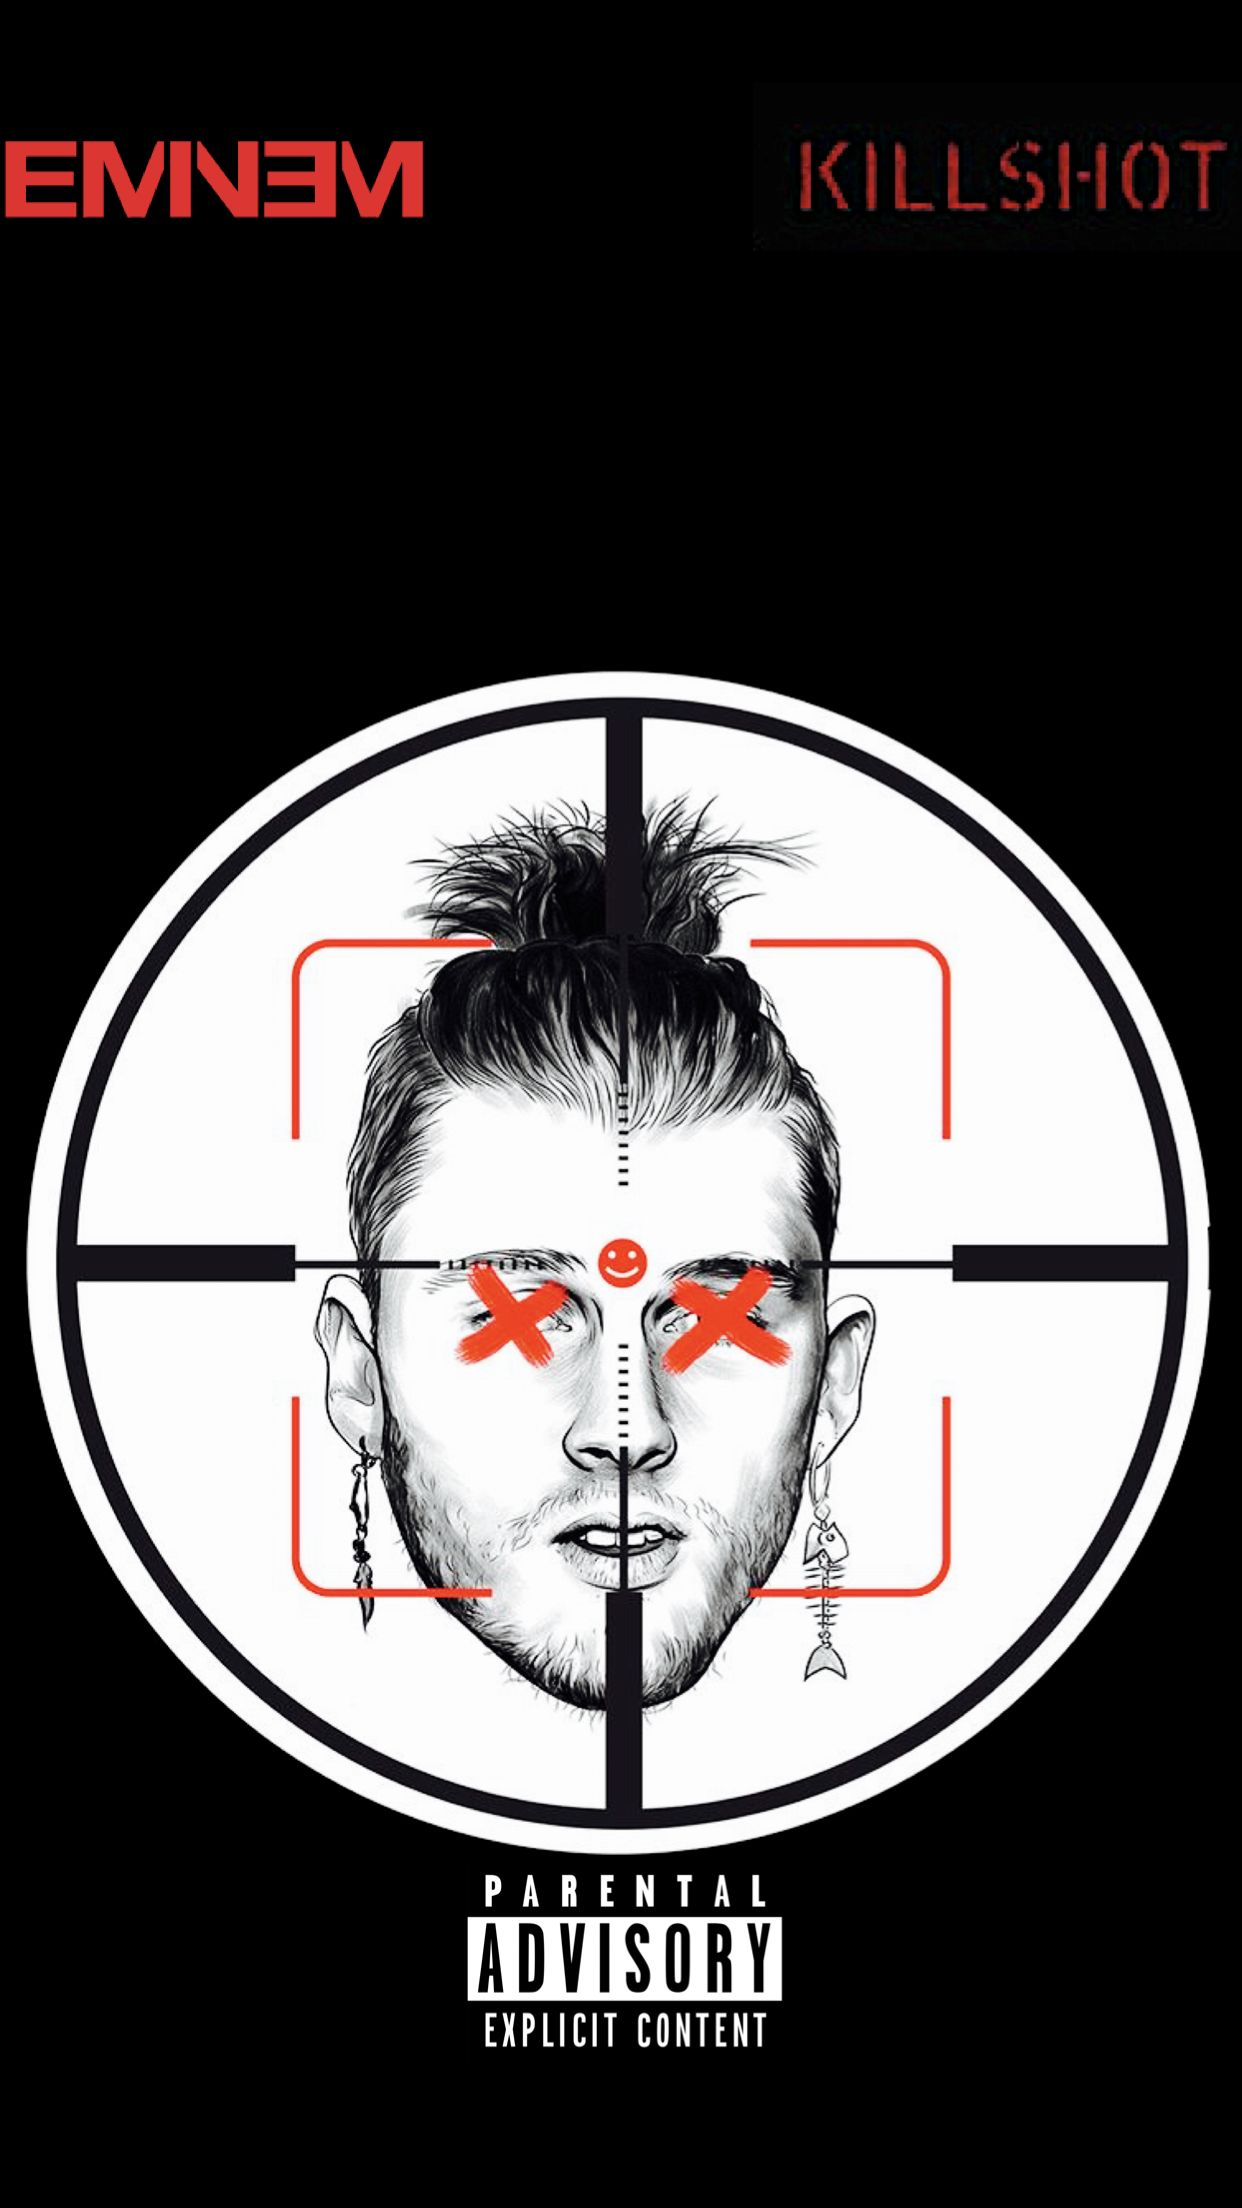 Eminem Kill Shot Cover Iphone Wallpaper Quotes In 2019 Eminem